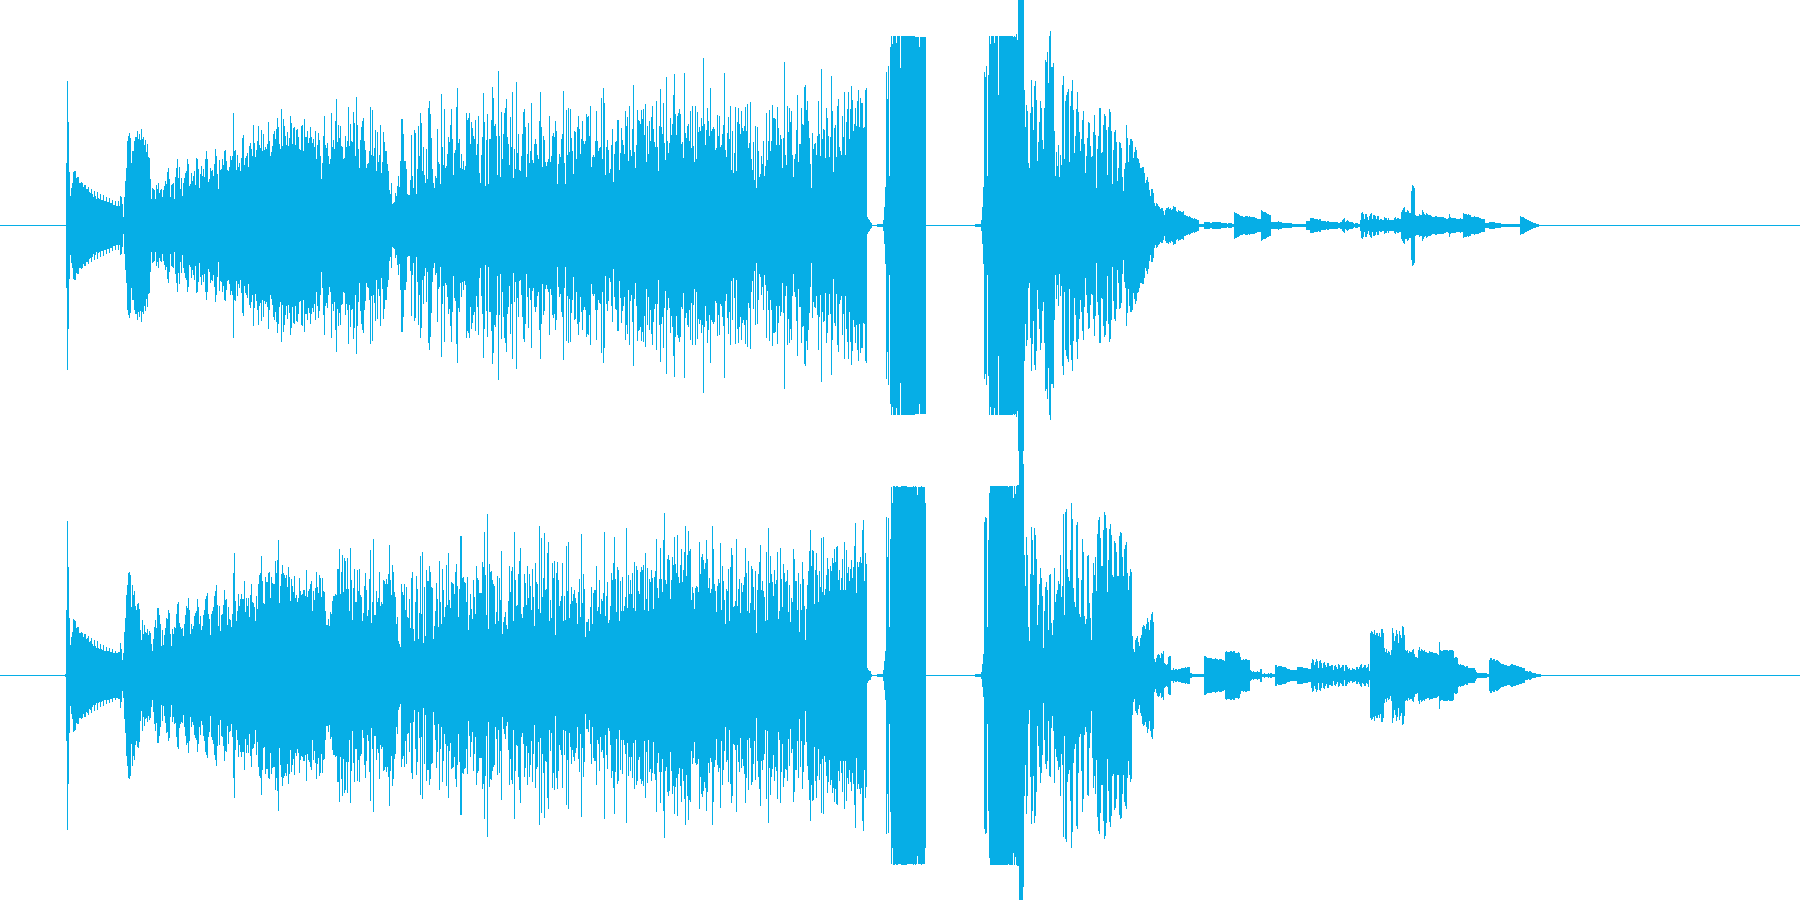 FMジングル 海外ラジオ風 DJ 効果音の再生済みの波形